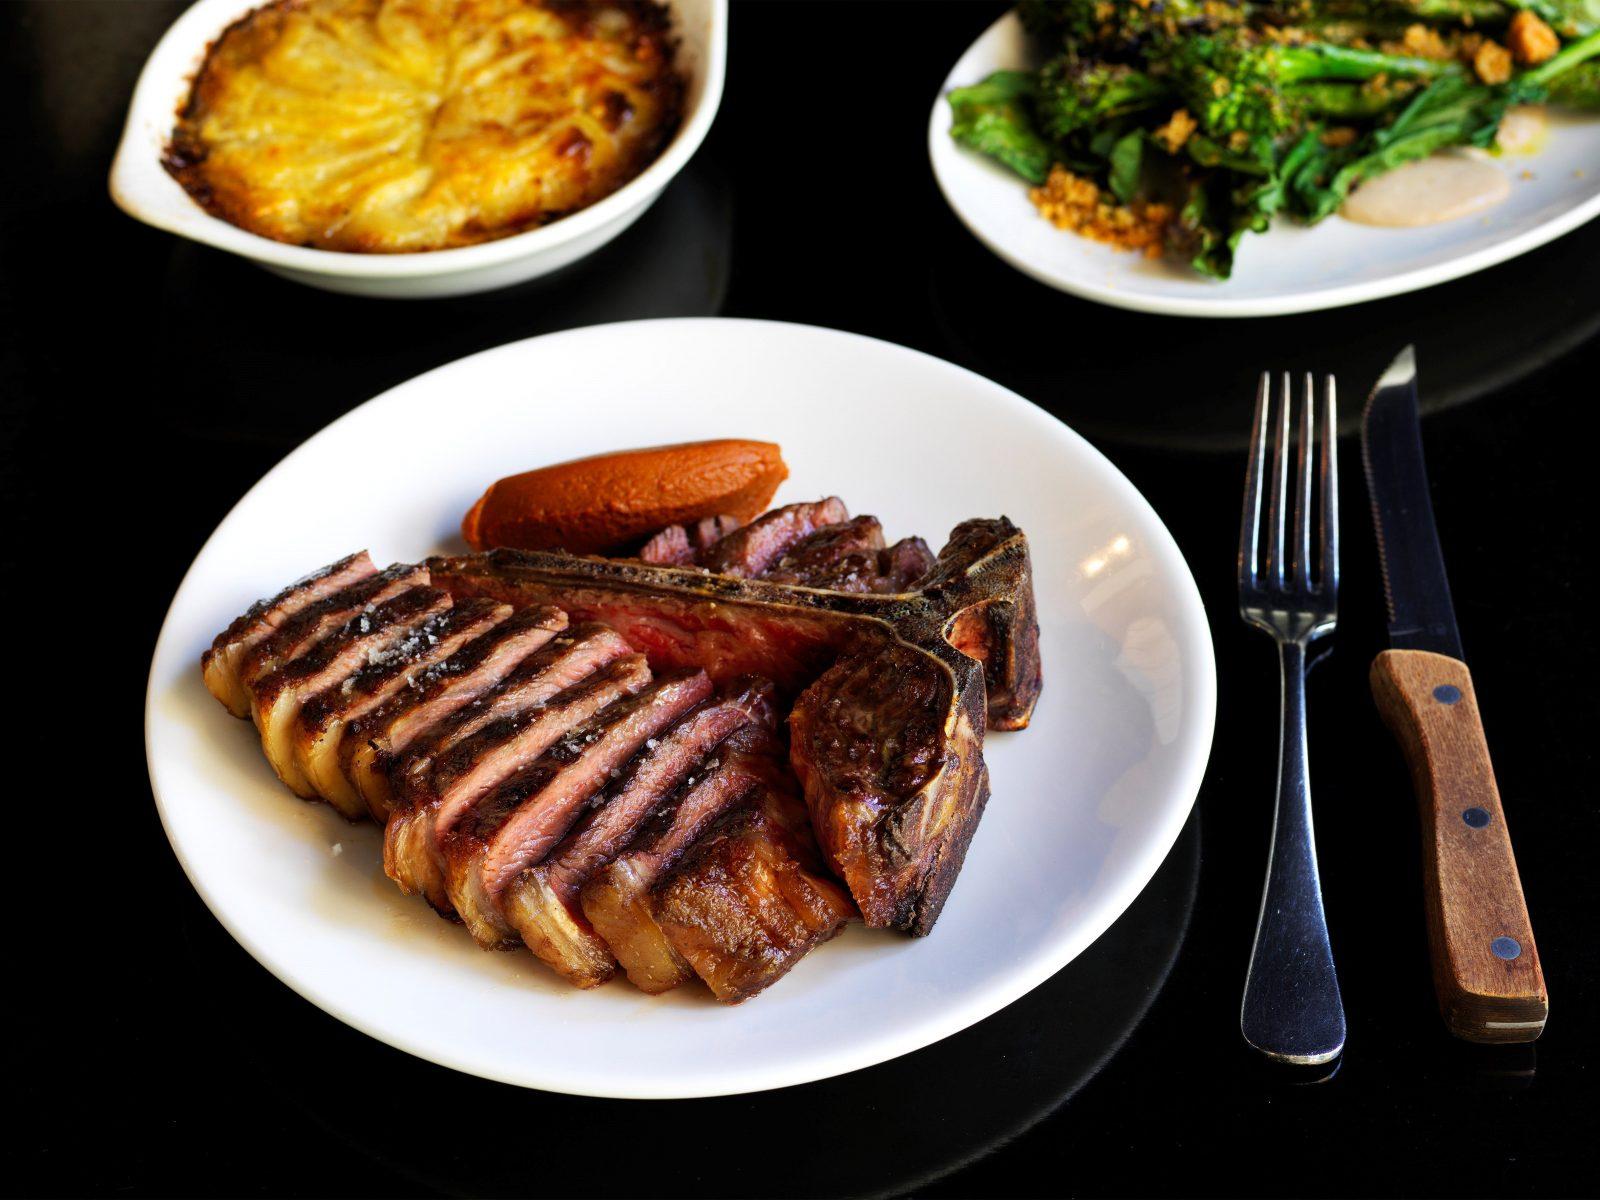 Wood Grilled T-Bone, Broccolini, Potato Gratin